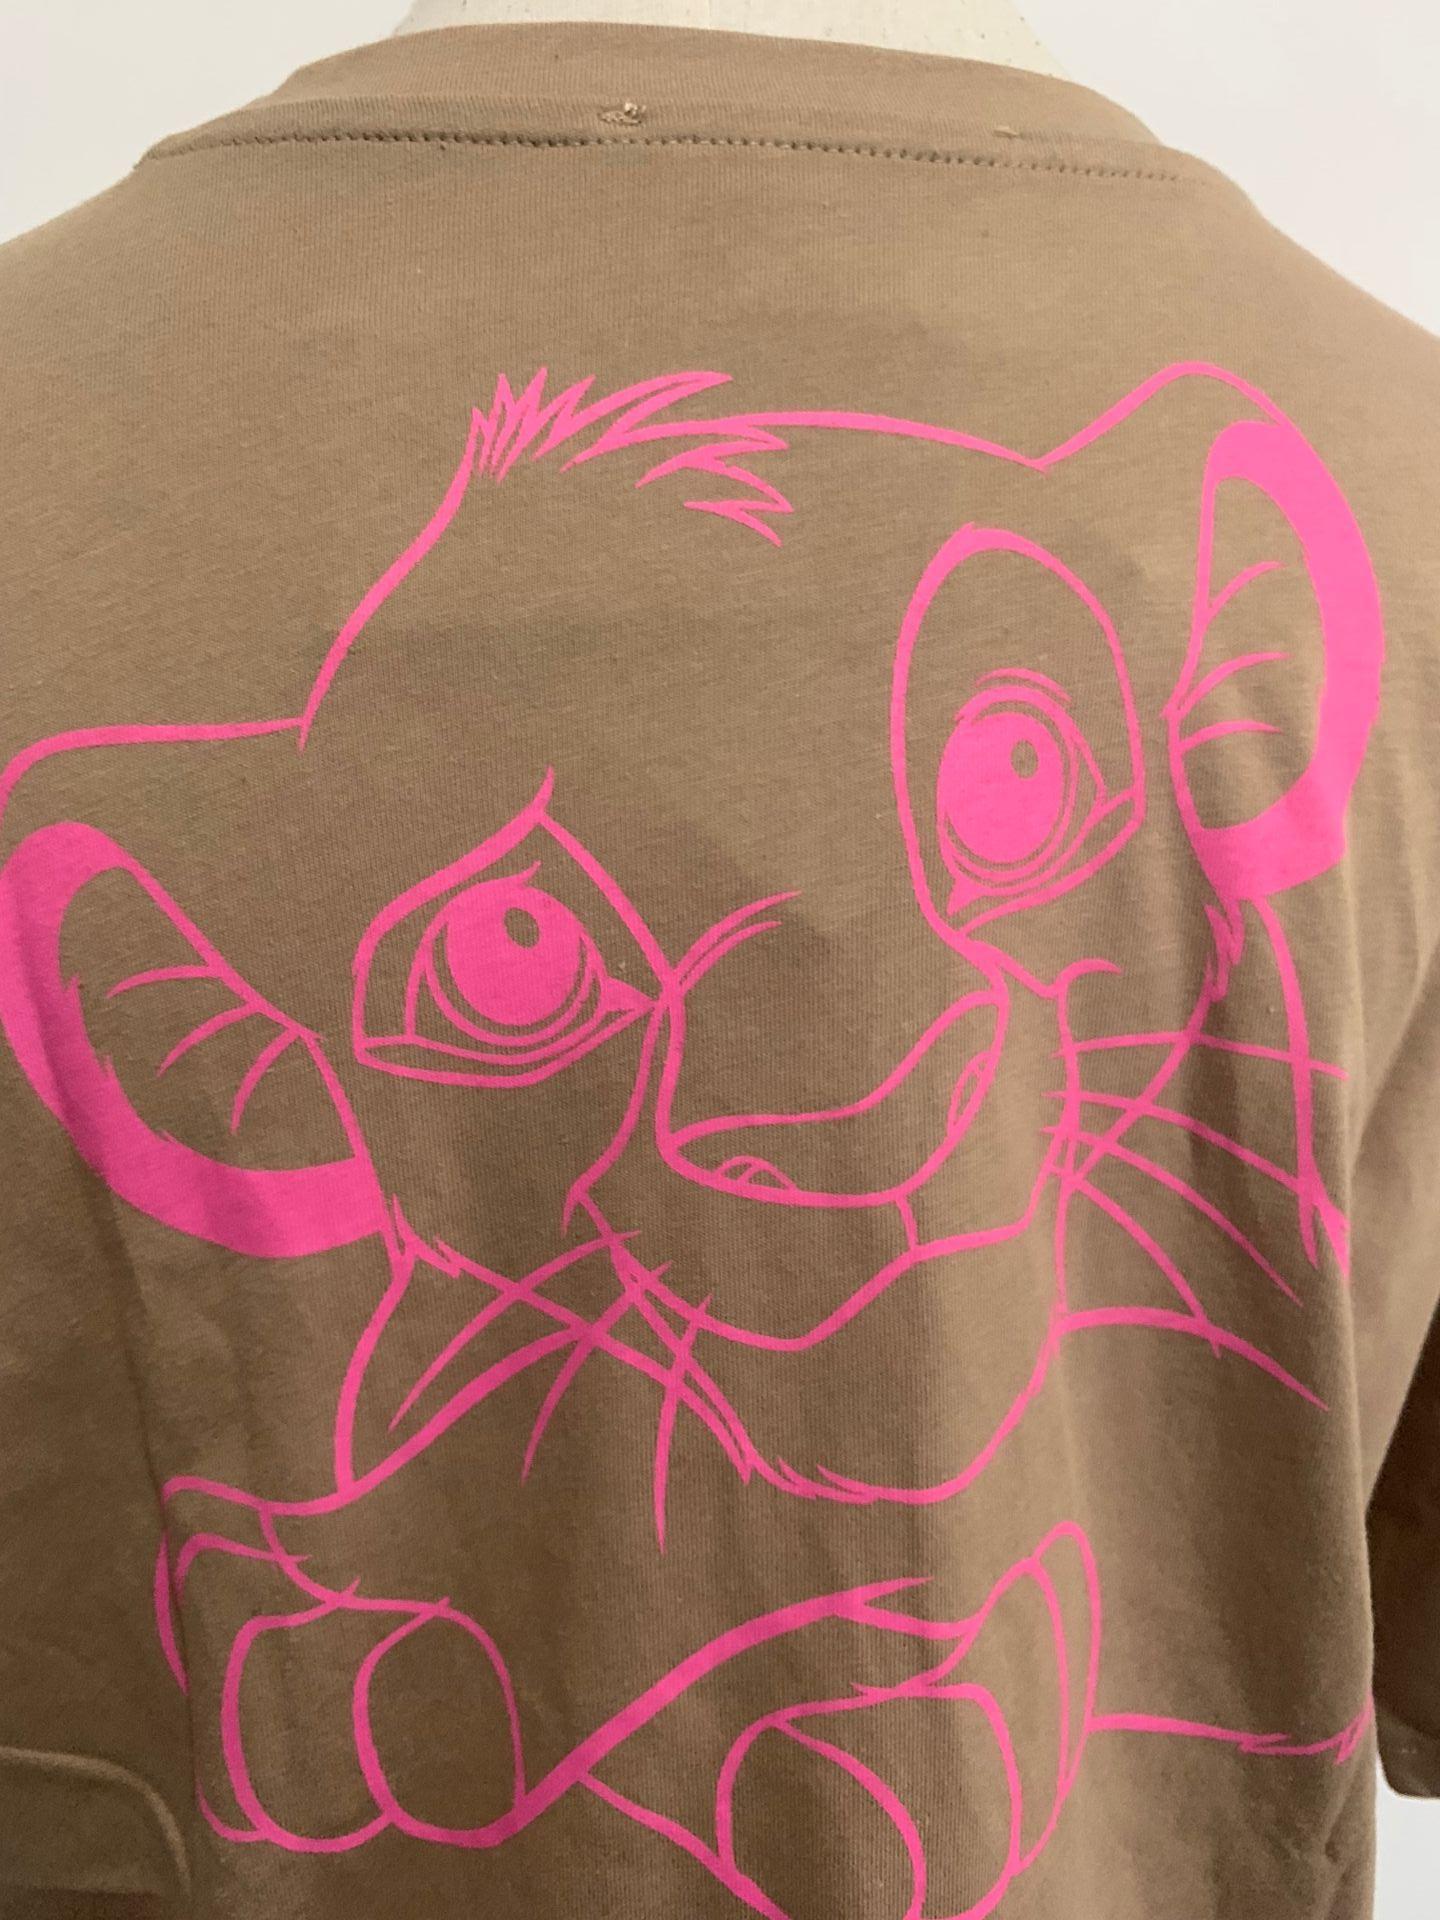 H24339e03a7204d87be011526cd30a500q Disney Family T-Shirt Fashion Winnie the Pooh Mickey Mouse Stitch Fairy Dumbo SIMBA Cartoon Print Women T-Shirt Cotton Tee s